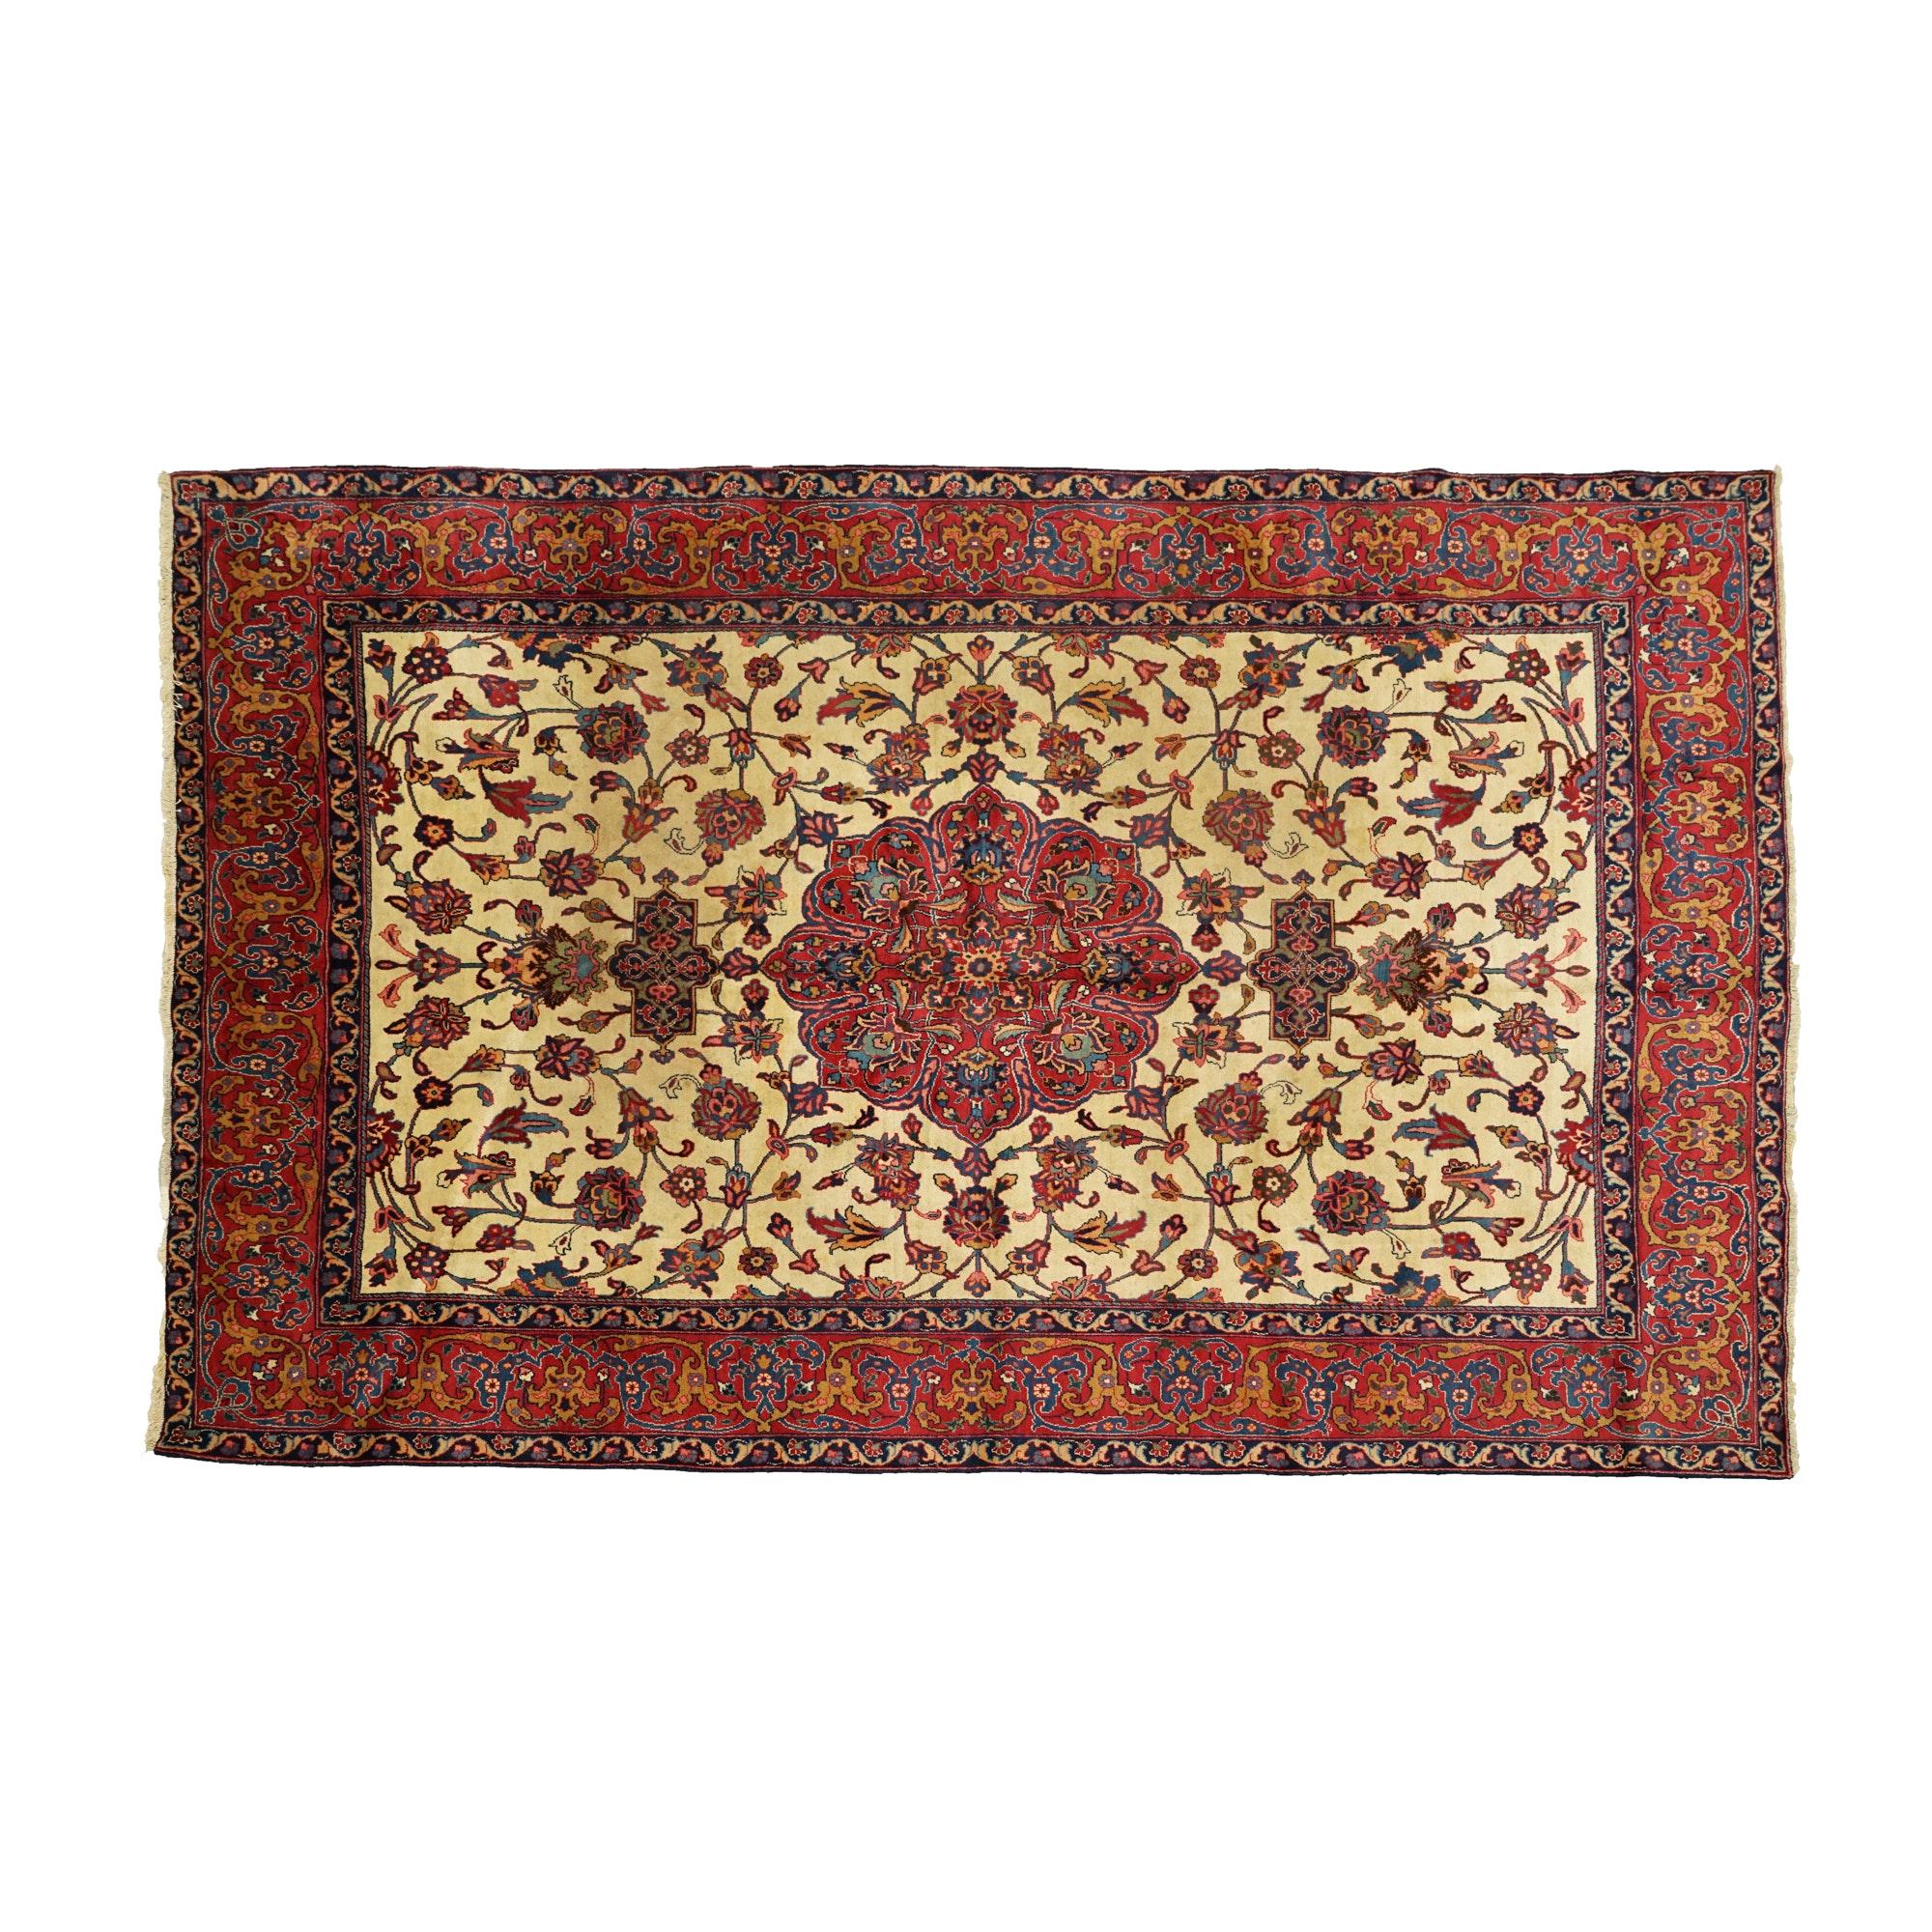 Hand-Knotted Persian Mashhad Wool Area Rug